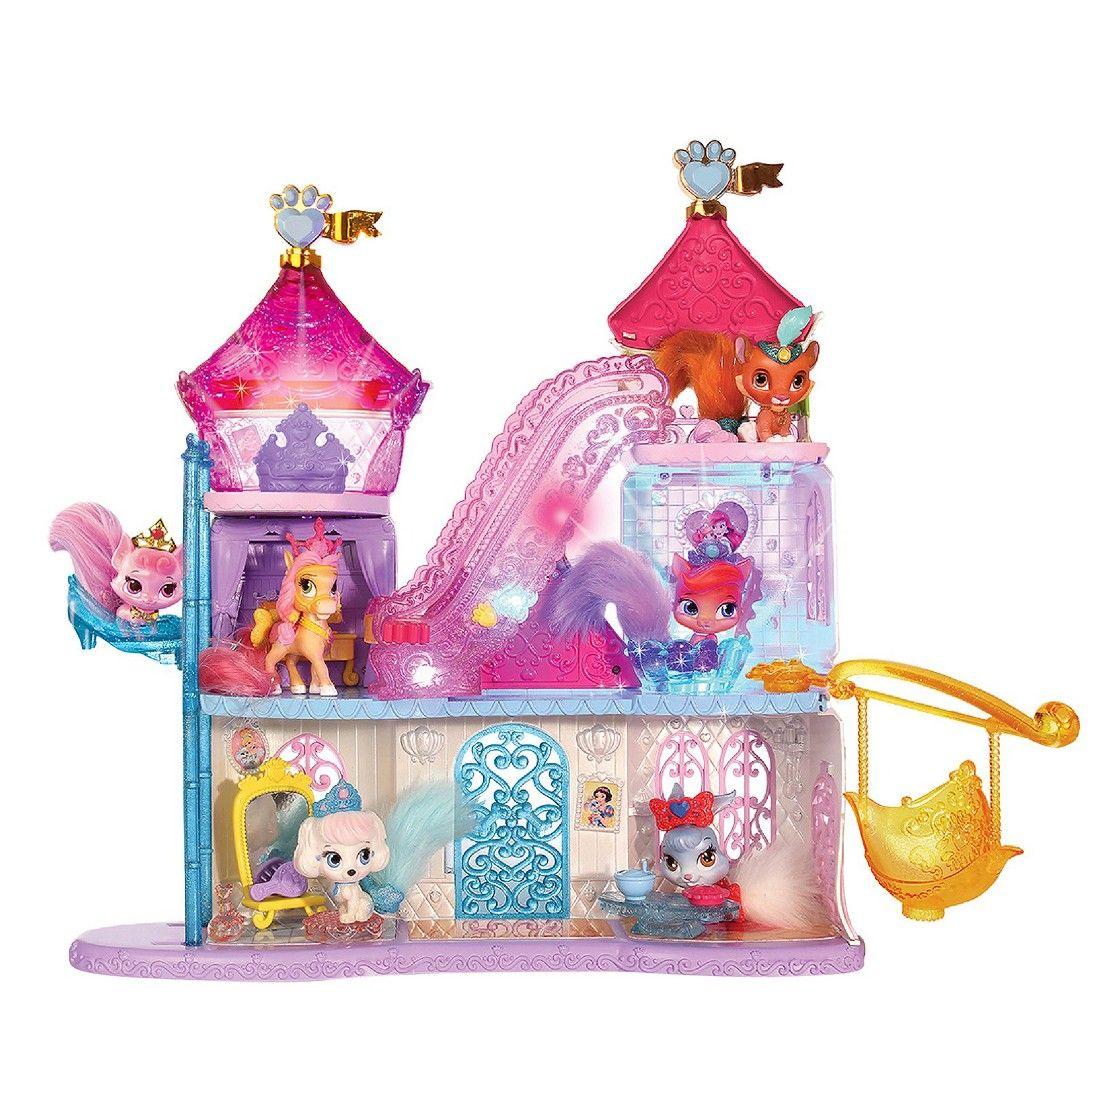 Disney Princess Palace Pets Magical Lights Pawlace Playset Whisker Haven Tails Princess Palace Pets Disney Princess Palace Pets Palace Pets